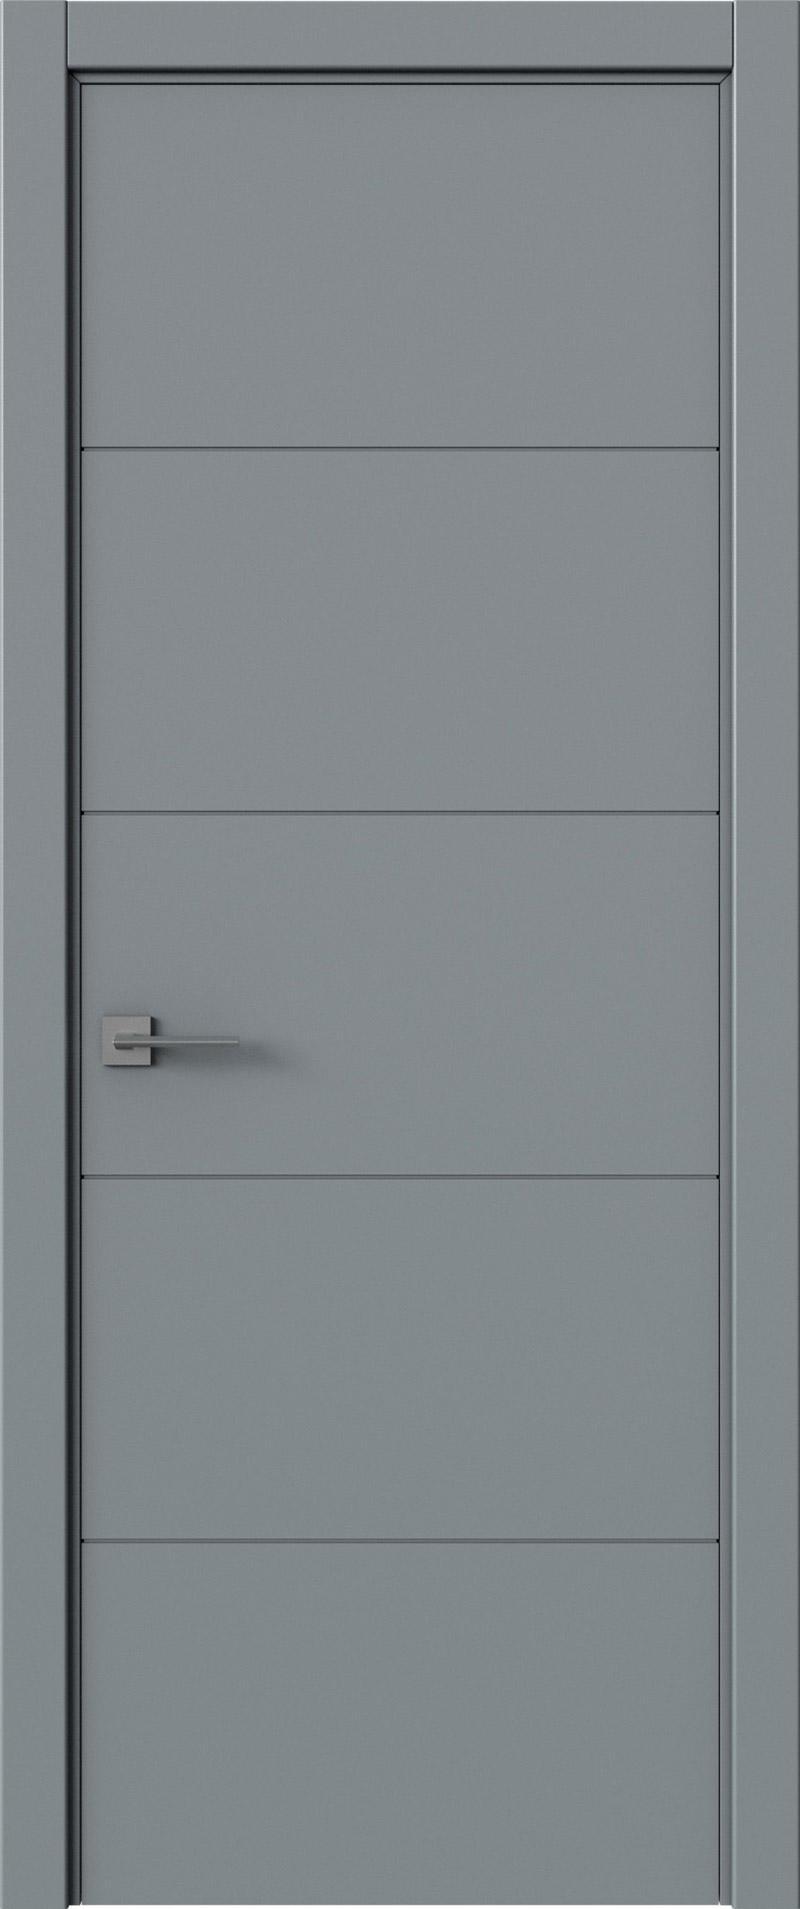 Tivoli Д-2 цвет - Серебристо-серая эмаль (RAL 7045) Без стекла (ДГ)